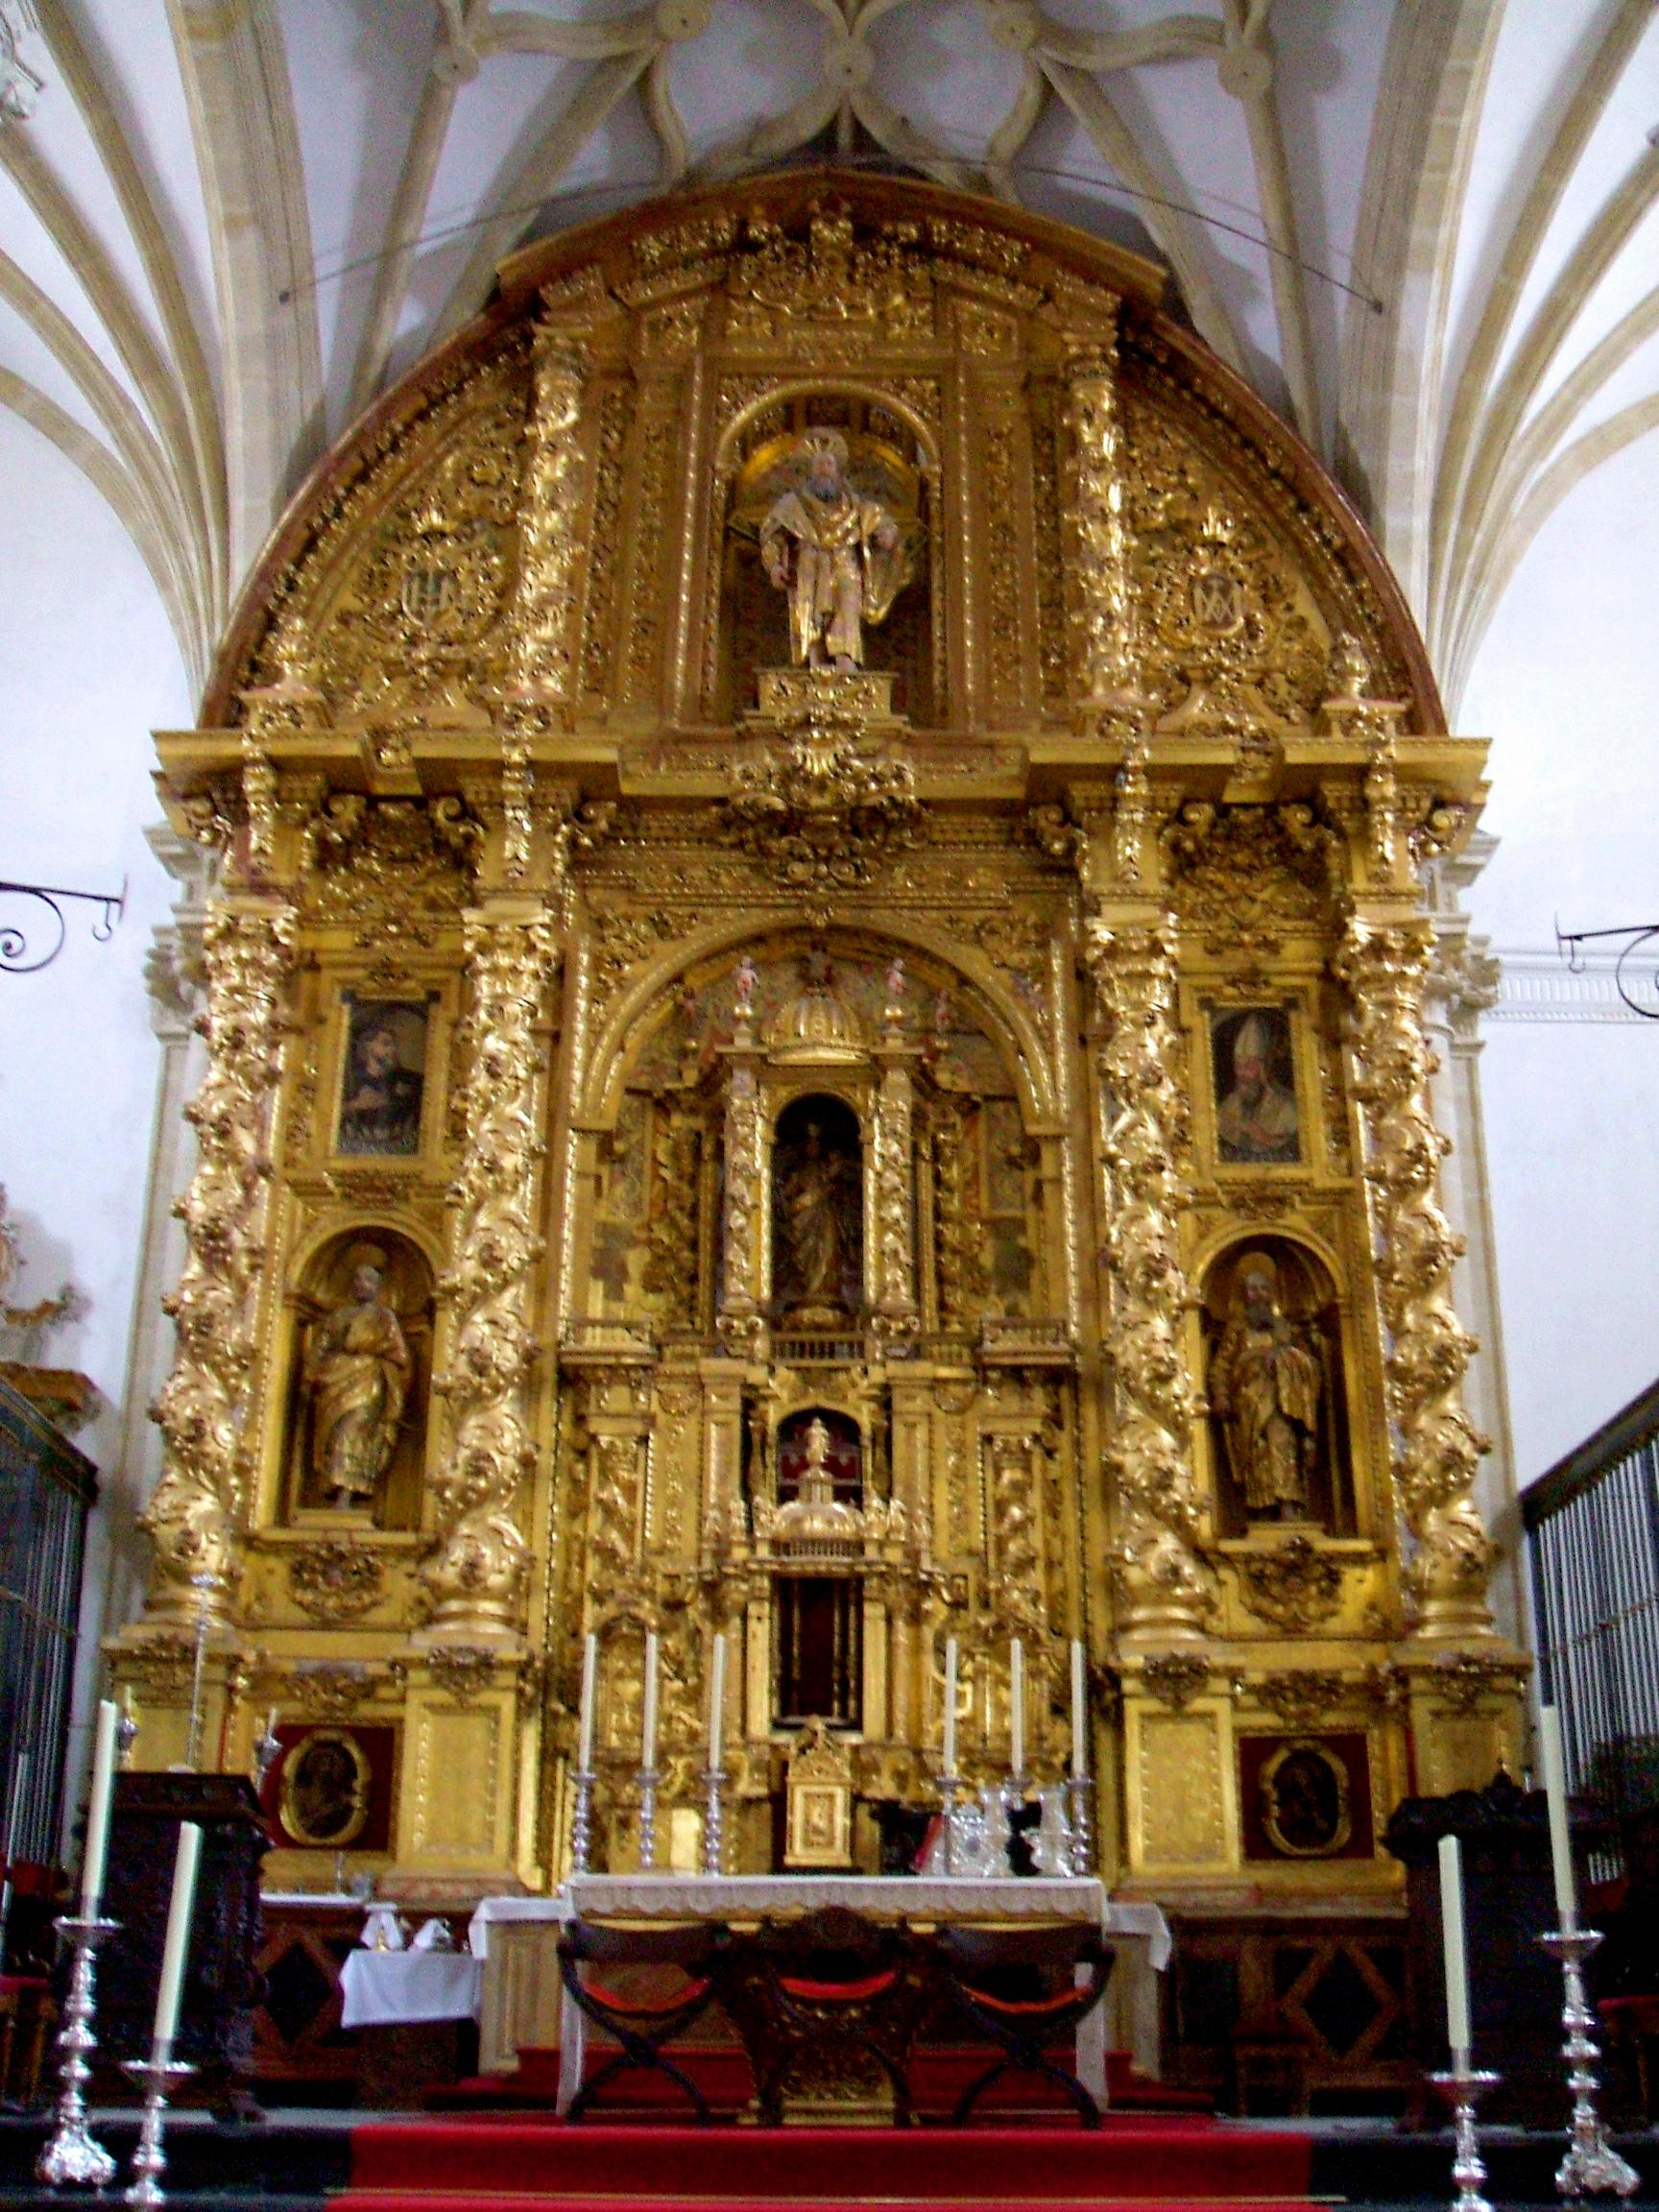 FileBaeza Catedral, interior 11.jpg Wikimedia Commons